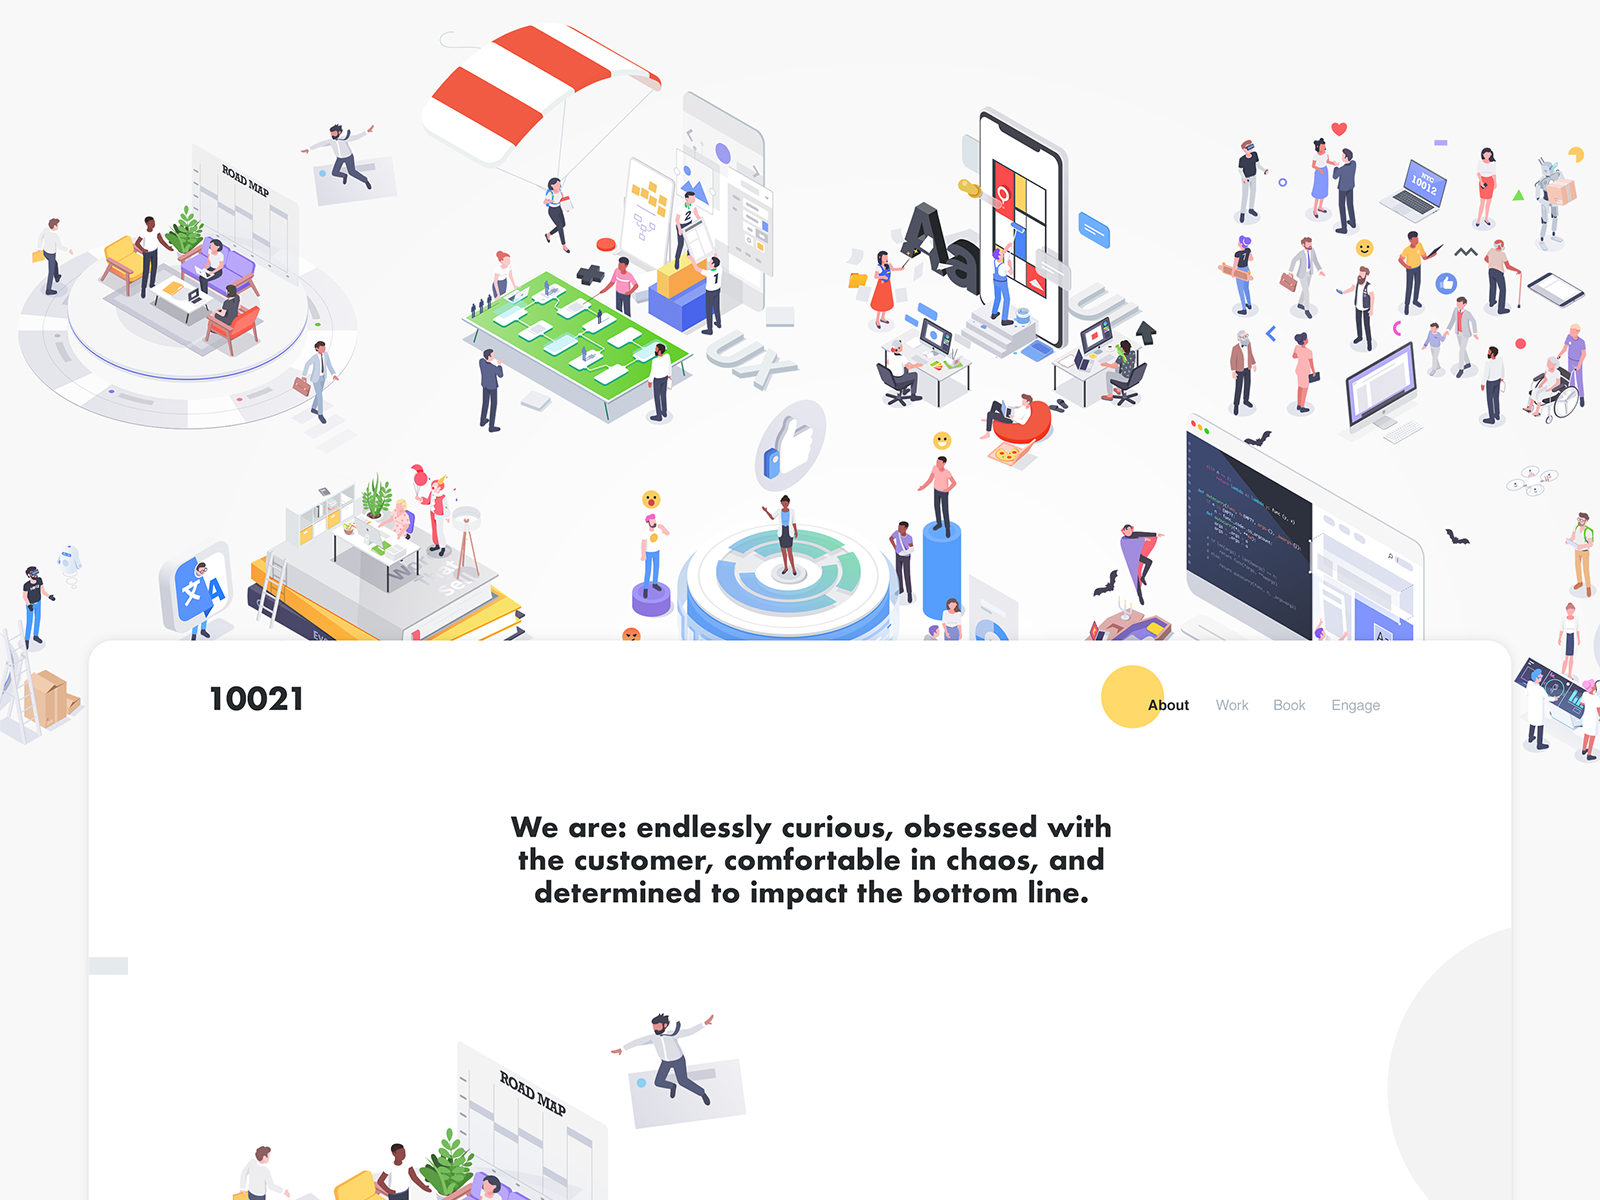 10012 office web design affinity characters illustration isometric rboy rocketboy